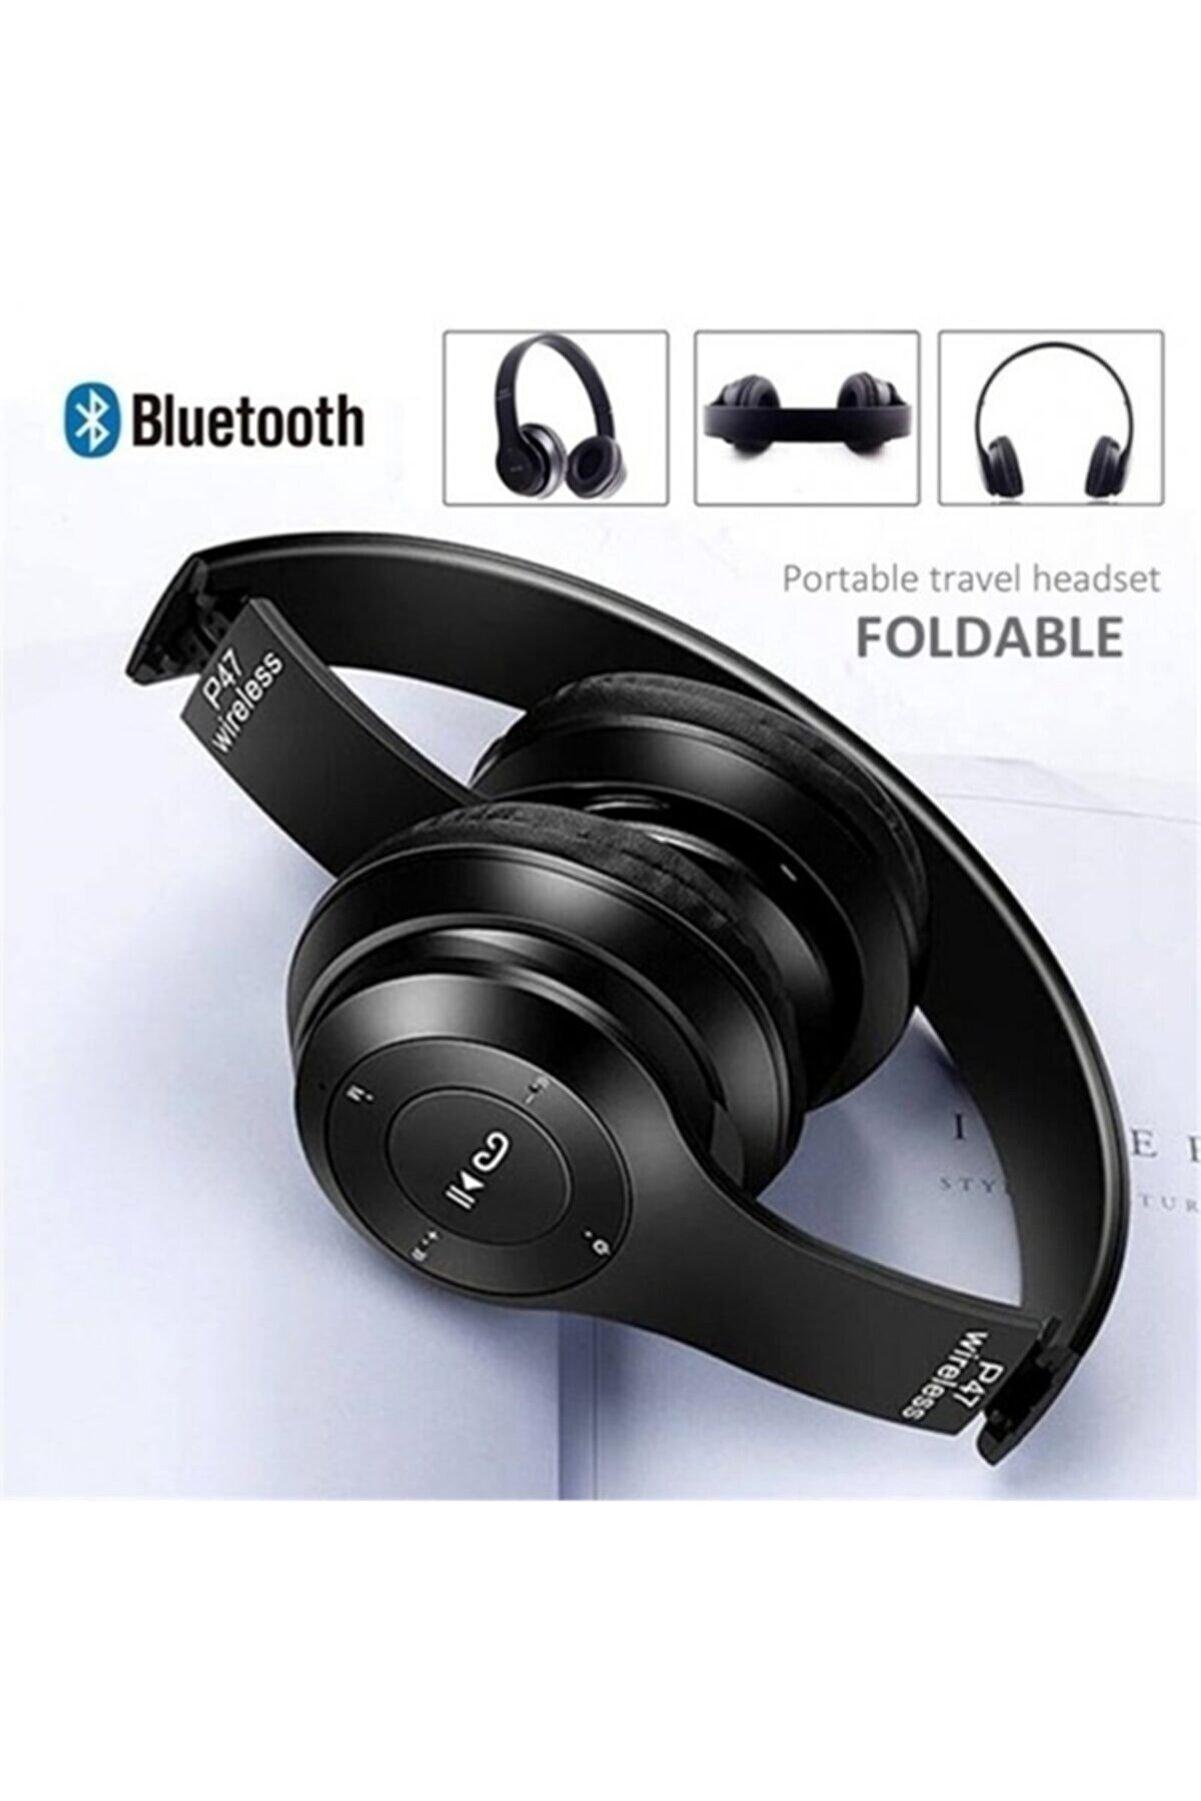 VY Aksesuar P47 5.0+edr Wireless Aux Kablolu Bluetooth Kulaklık 5.0+edr-p47